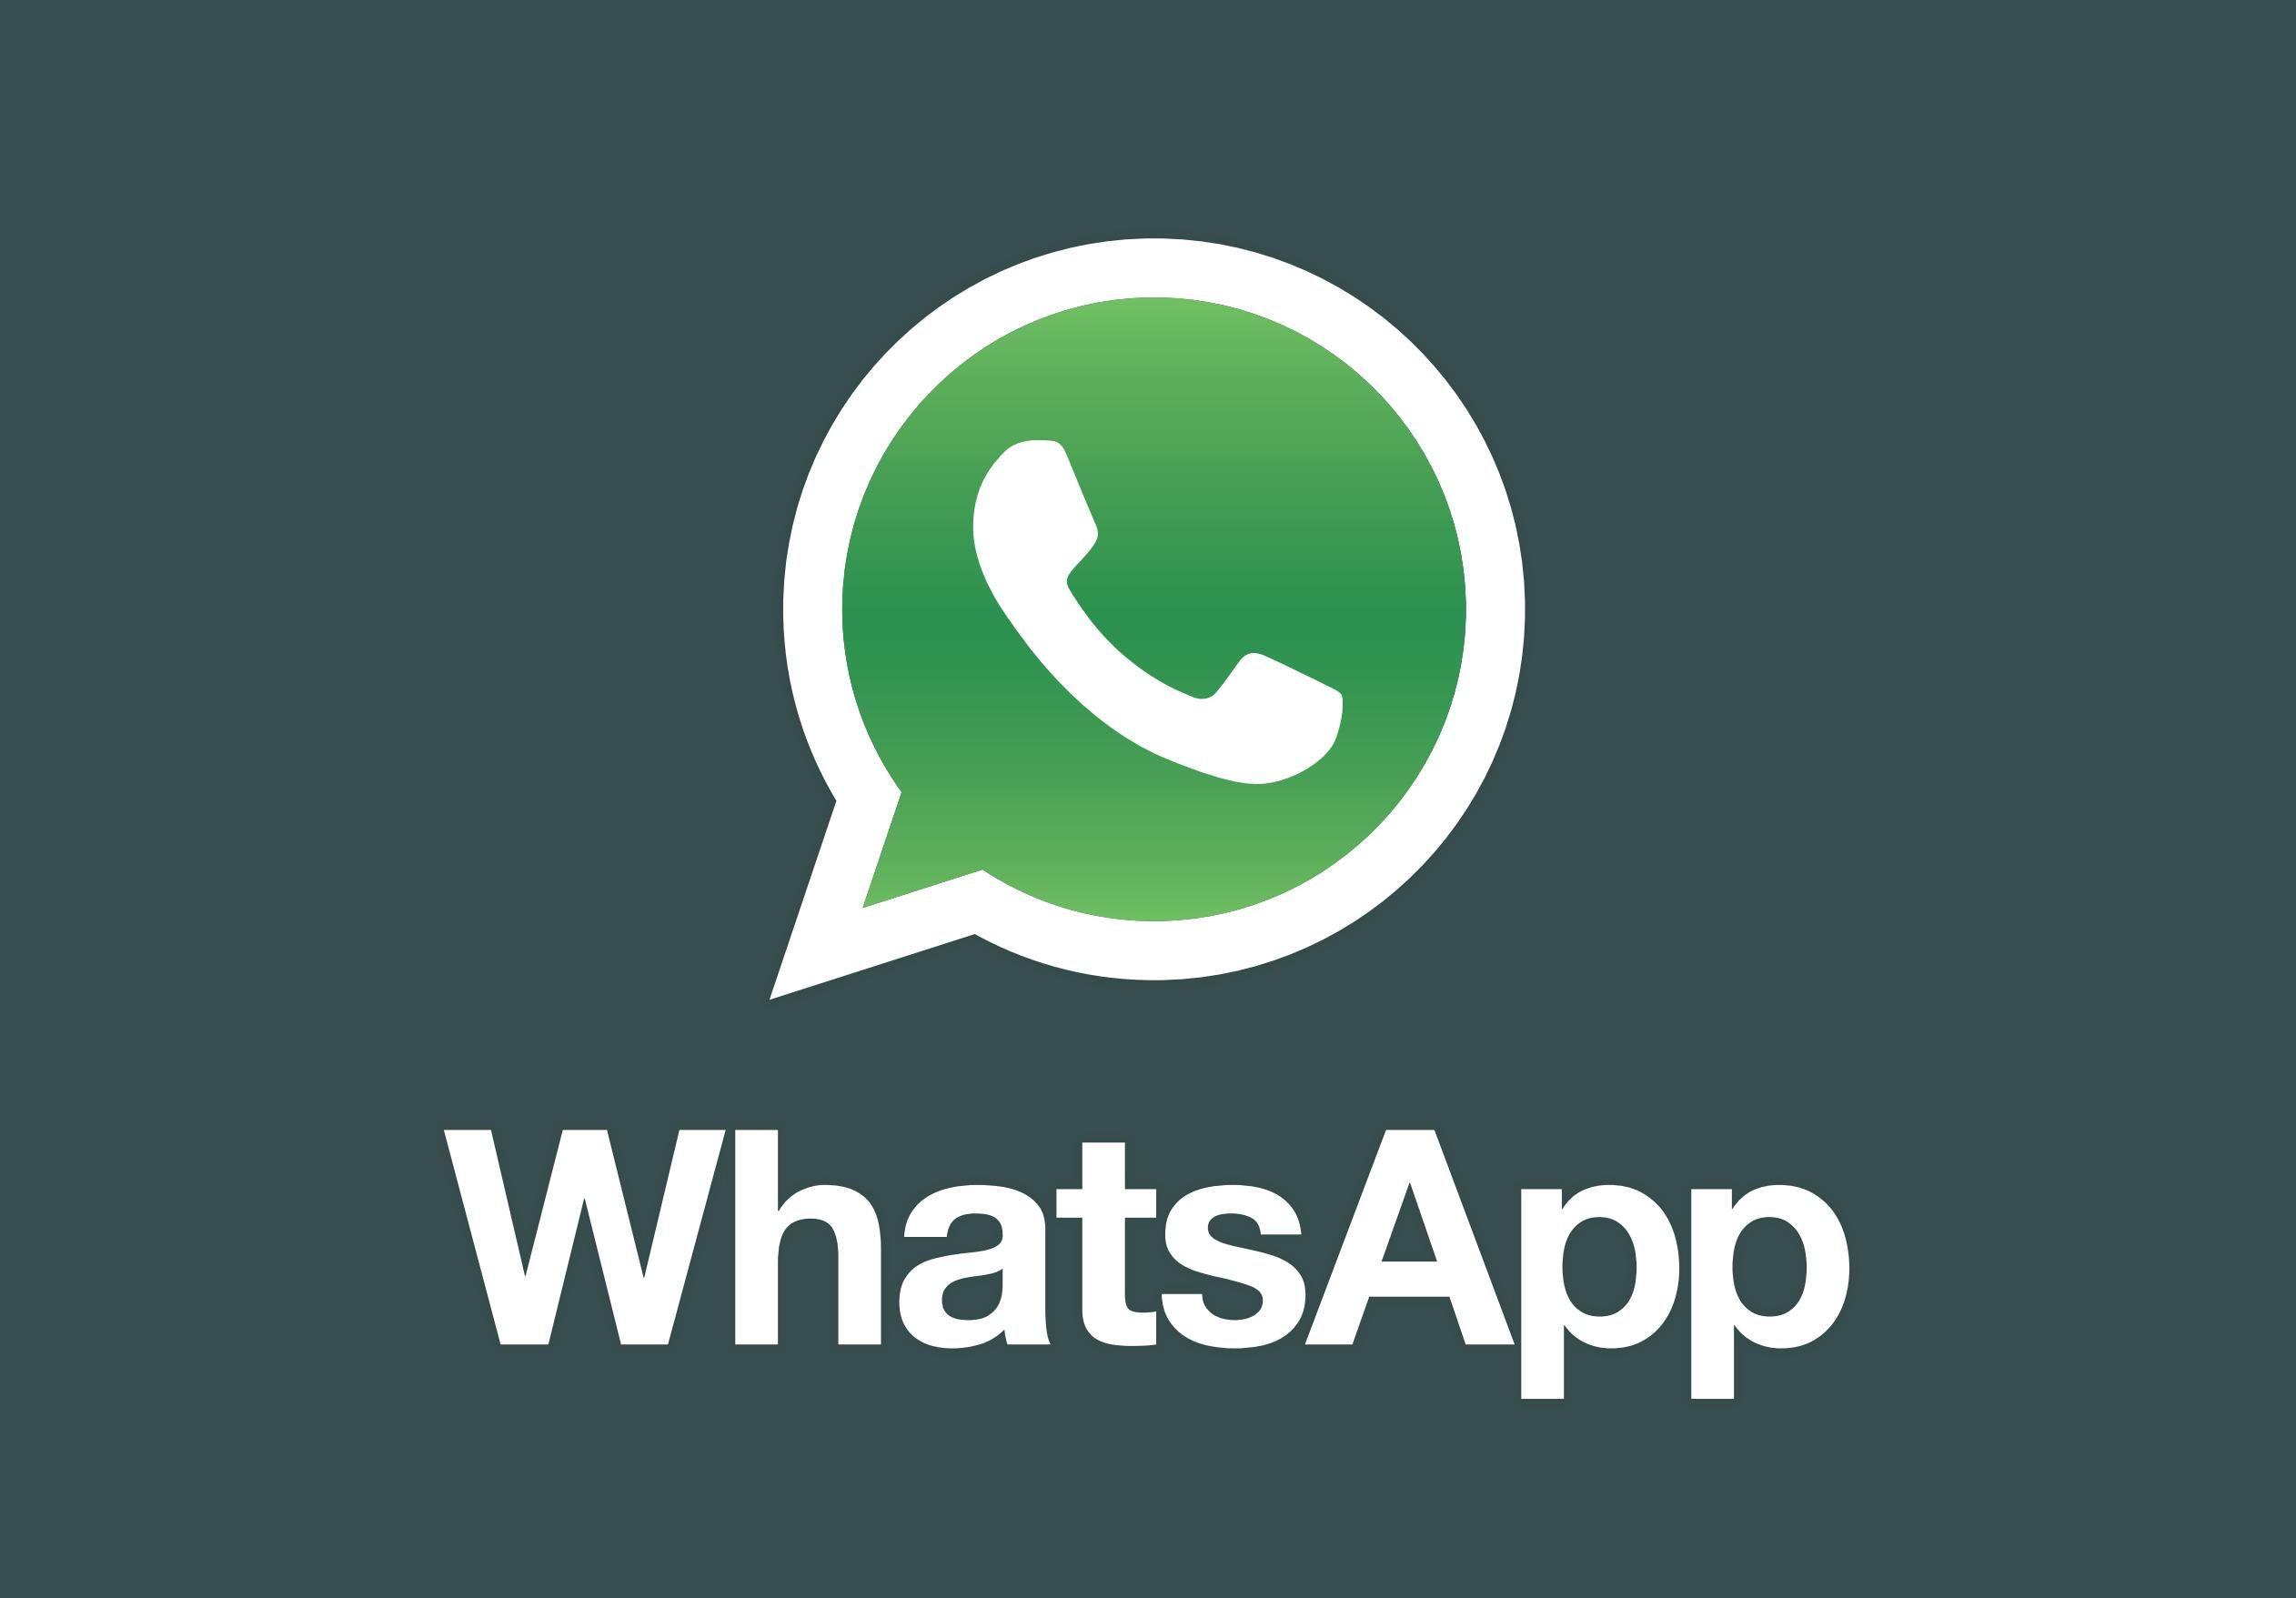 Whatsapp Logo Vector Free Logo Eps Download Messaging App Messages Ipad Tutorials